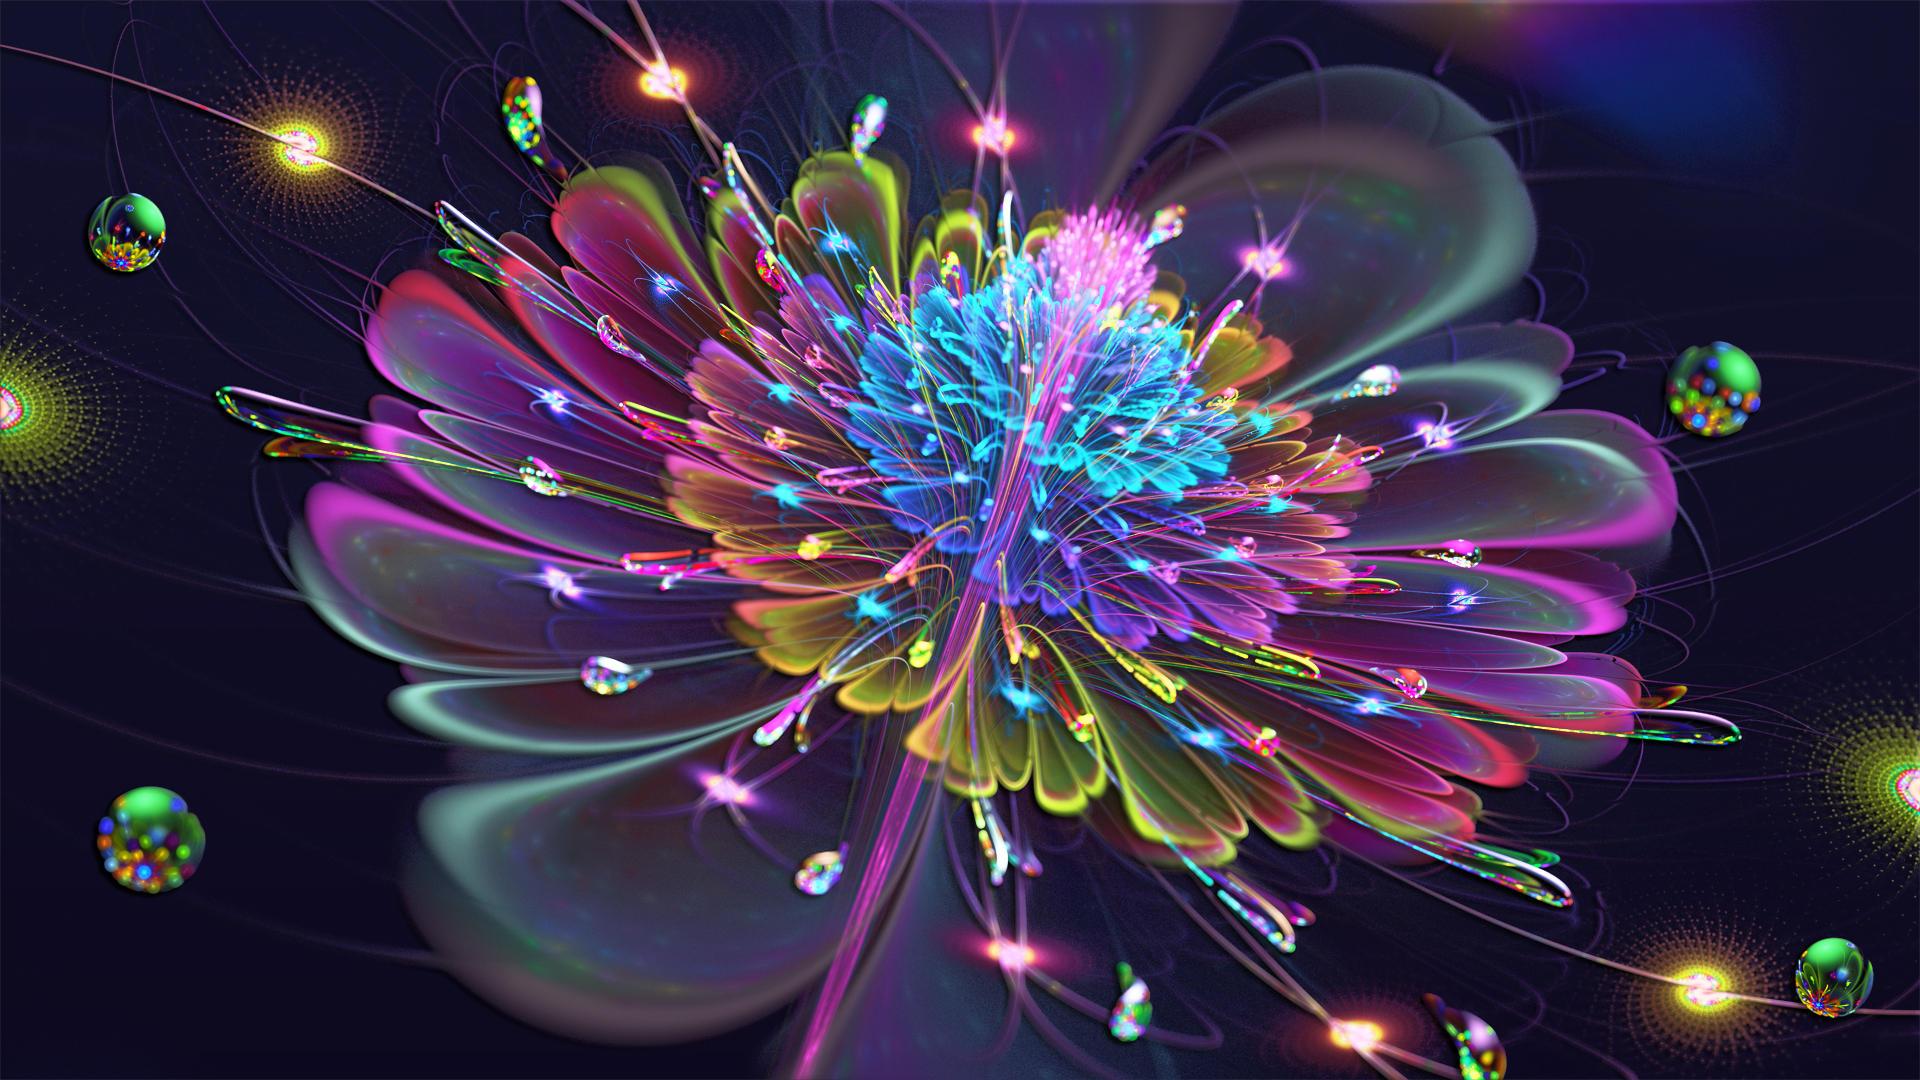 Fleur de vibrant by frankief on deviantart - Vibrant background ...